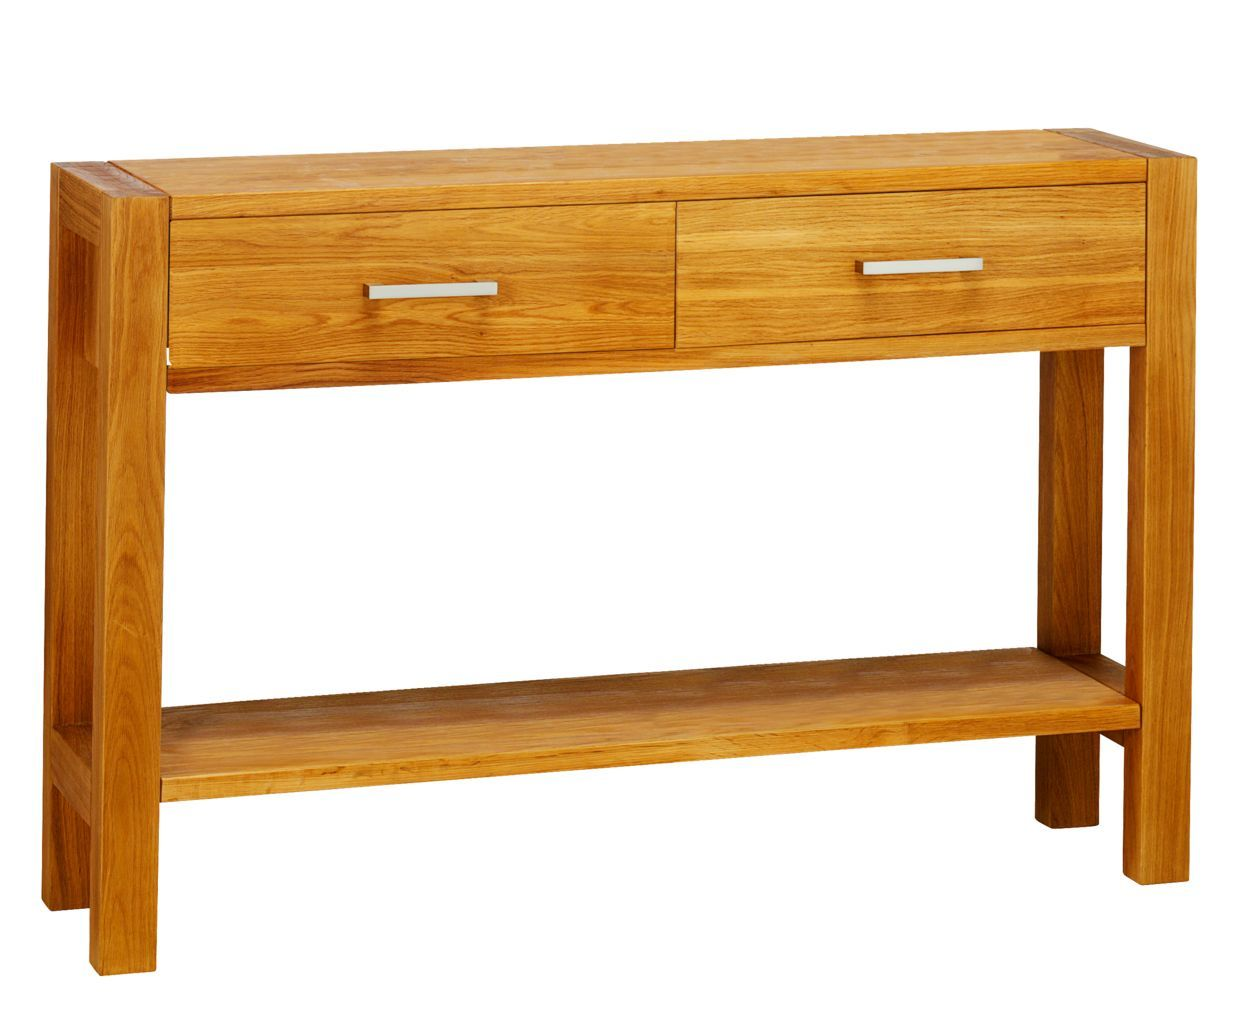 Salle De Bain Carrelage Beige Marron ~ console table silkeborg oiled oak jysk consolle drapier pinterest